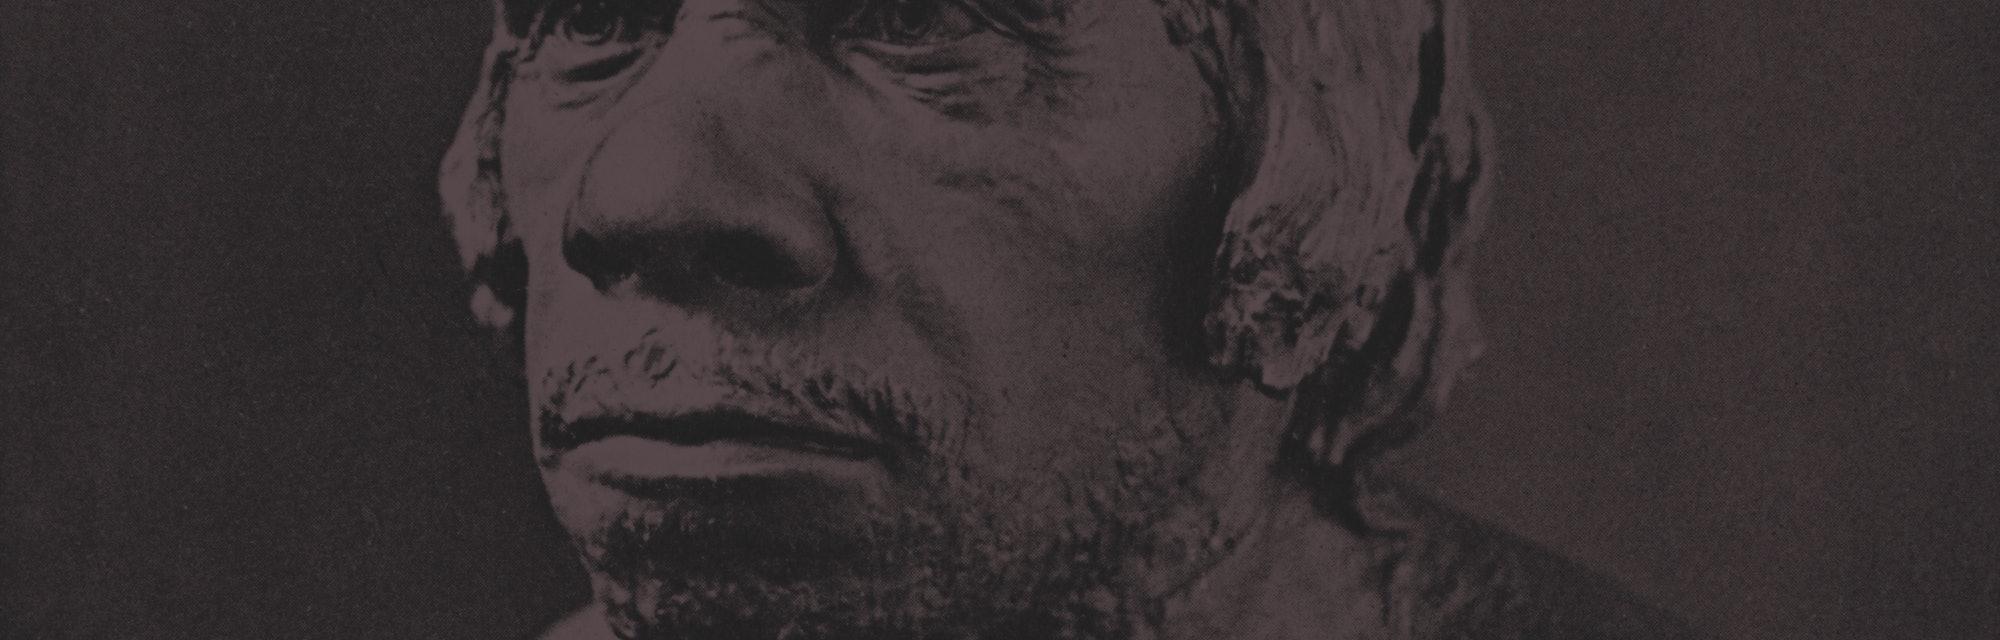 Neanderthal bust